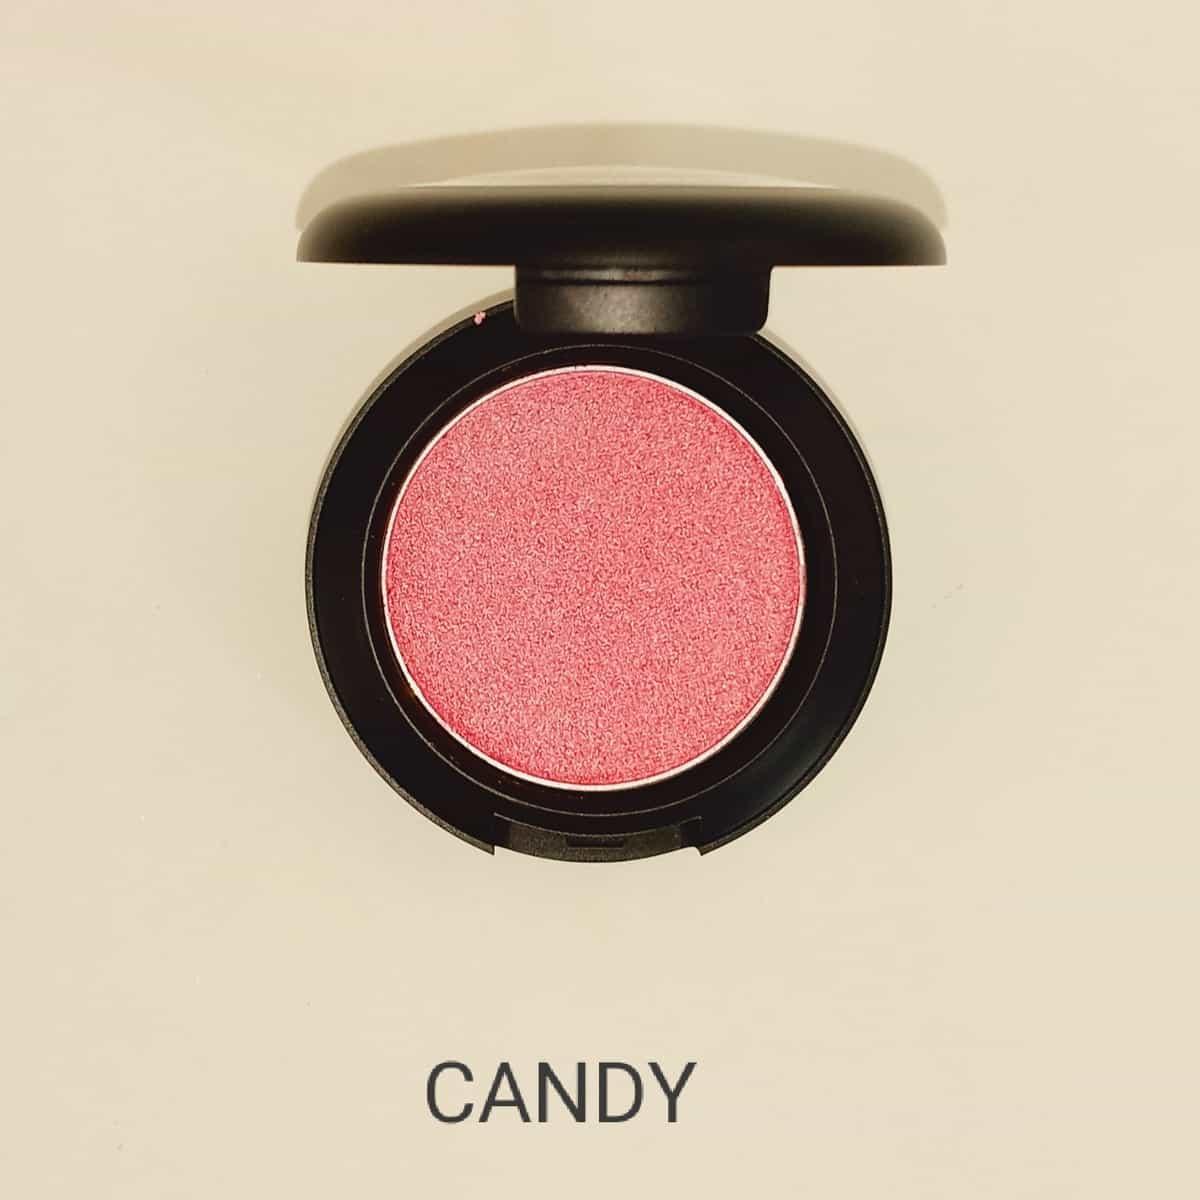 Candy-min